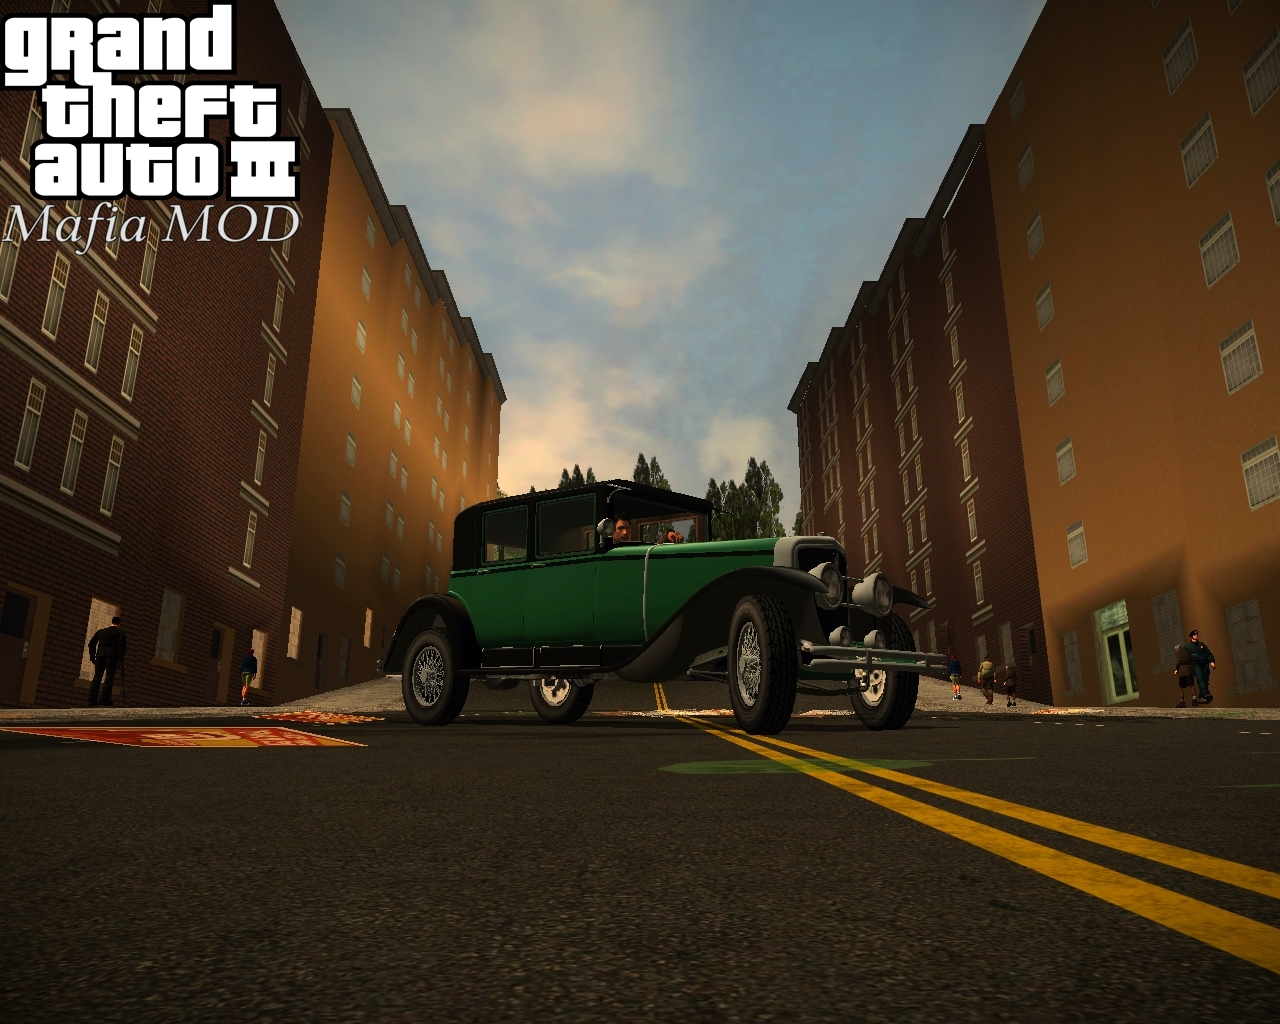 PRESENTATION6.jpg - Grand Theft Auto 3